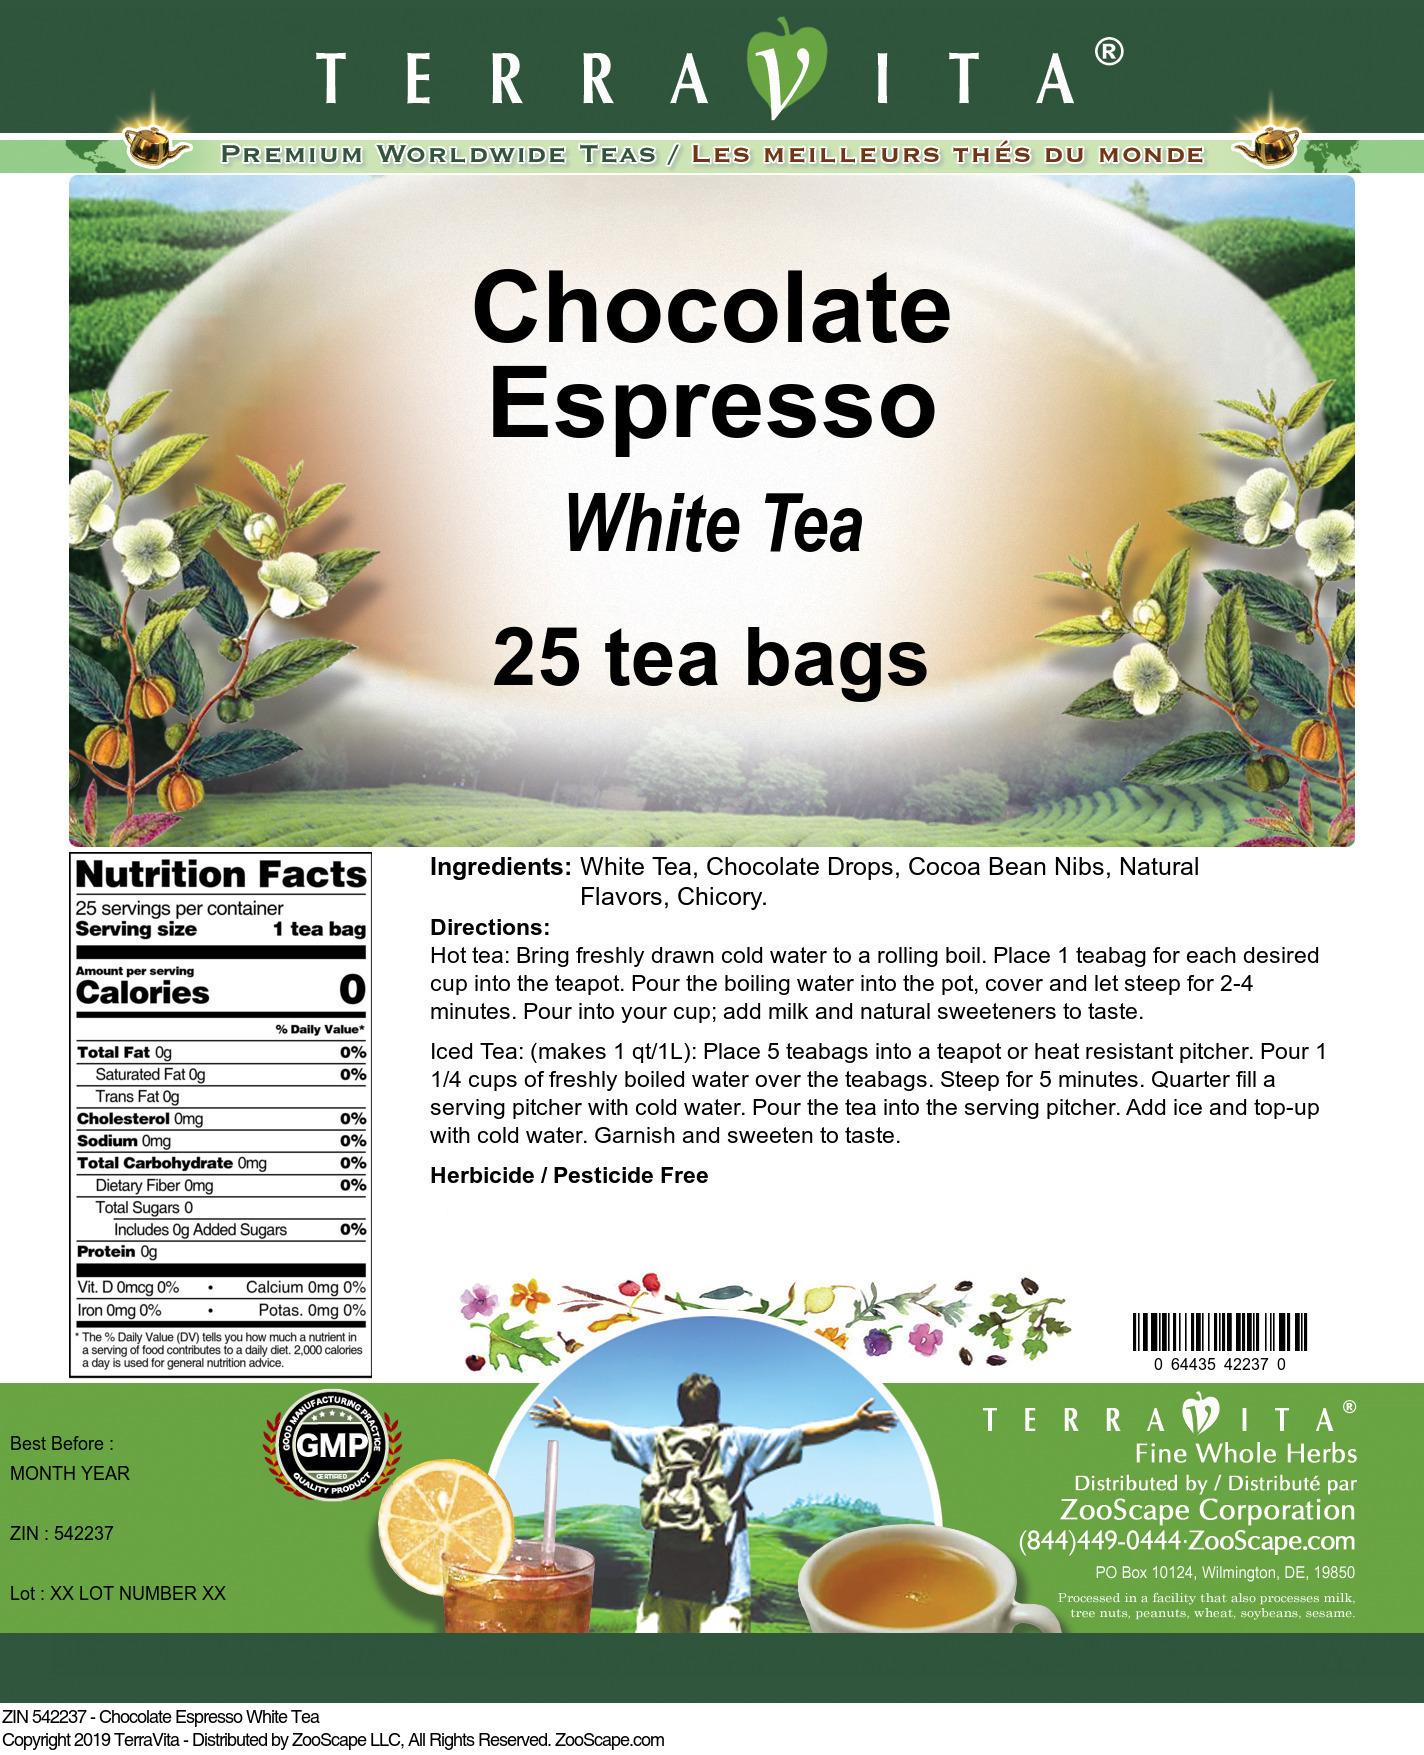 Chocolate Espresso White Tea